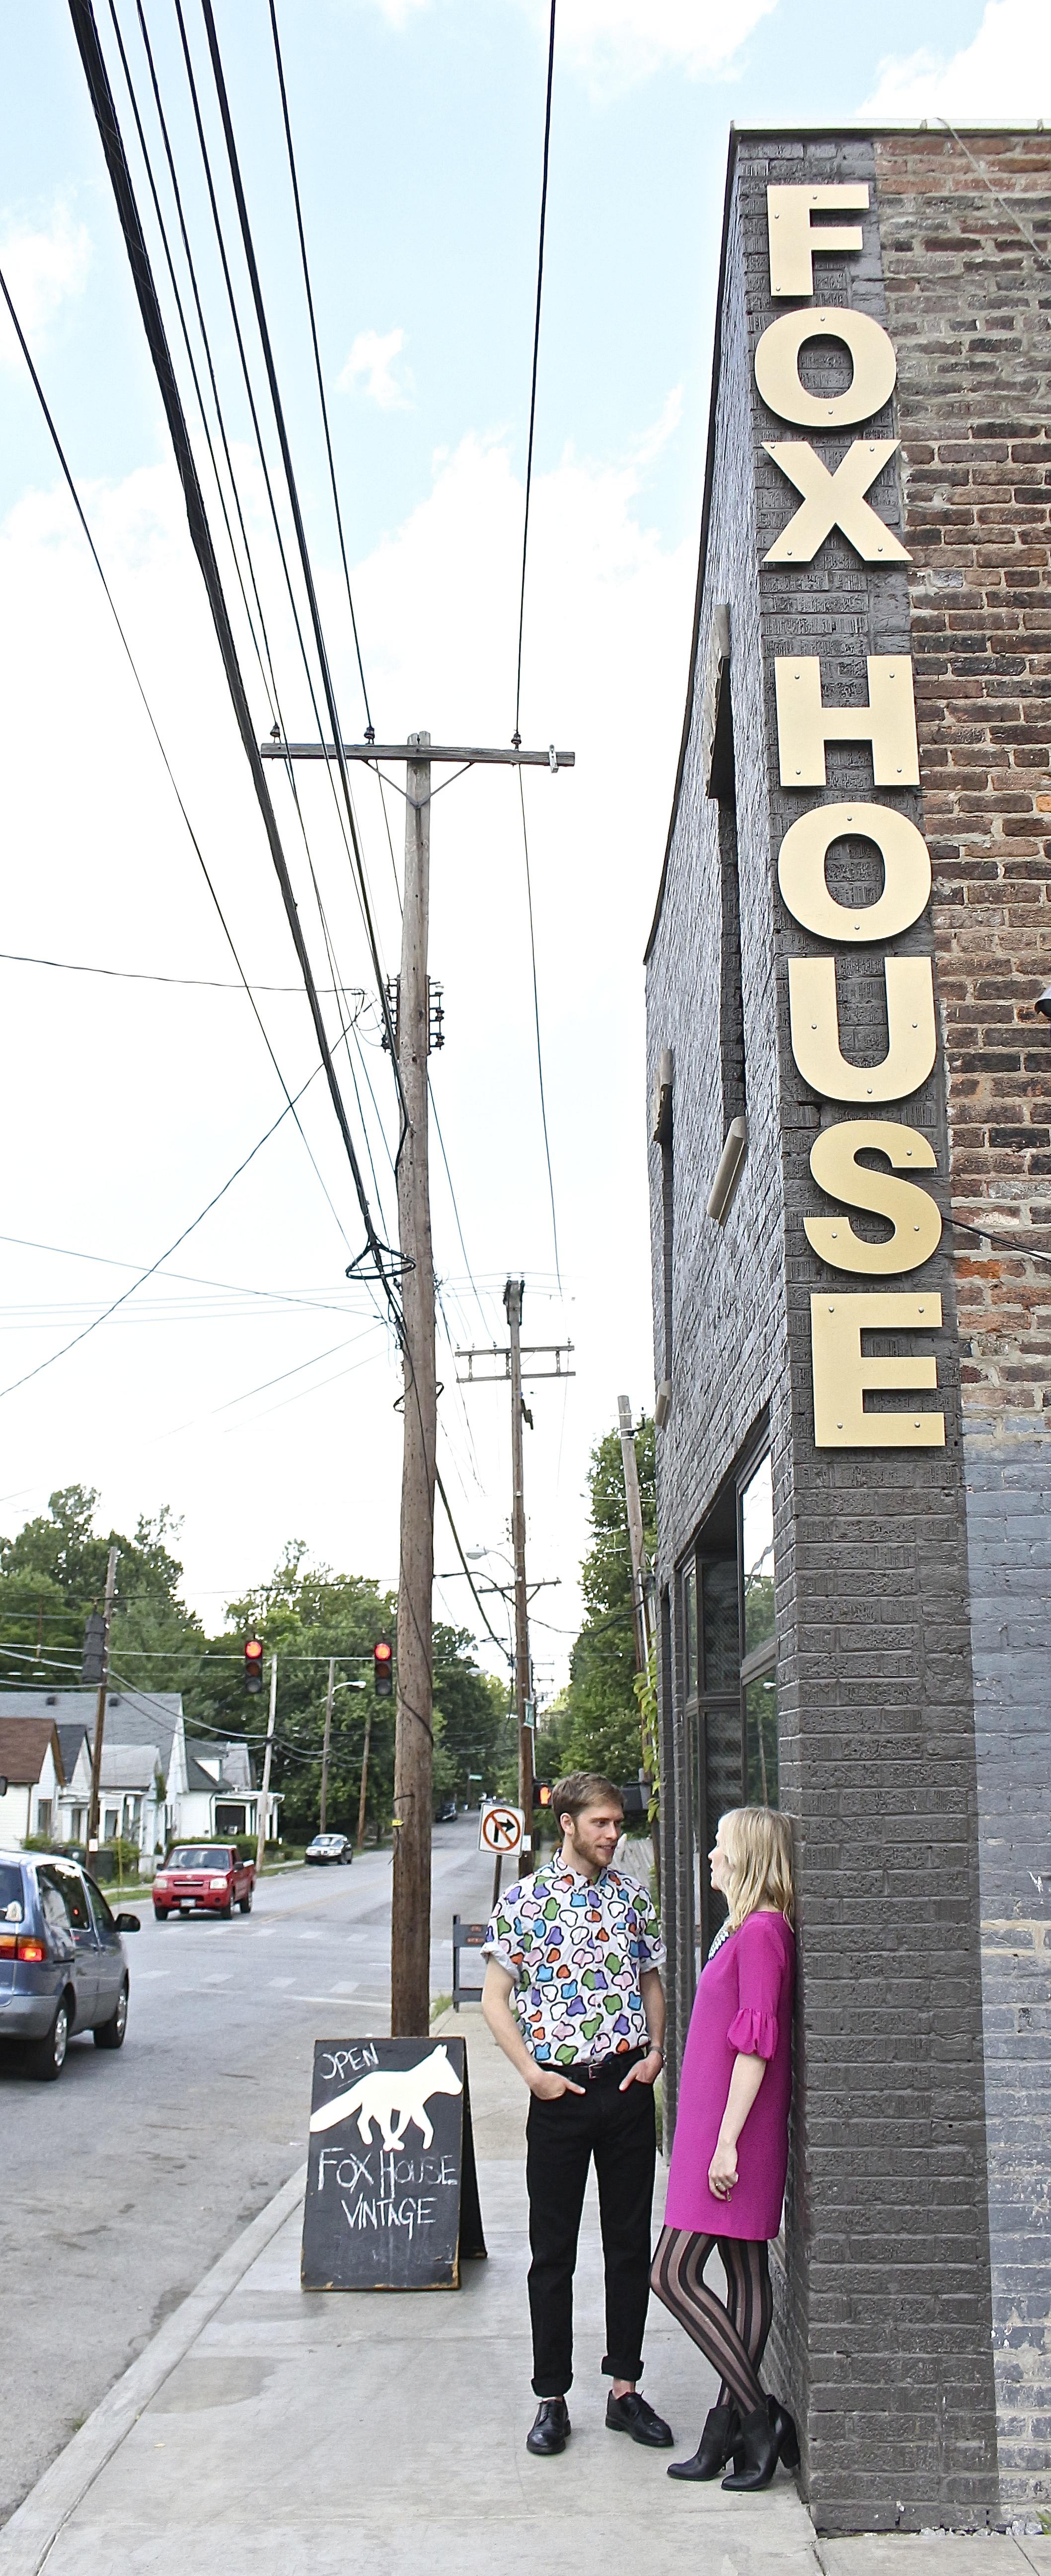 Foxhouse Vintage